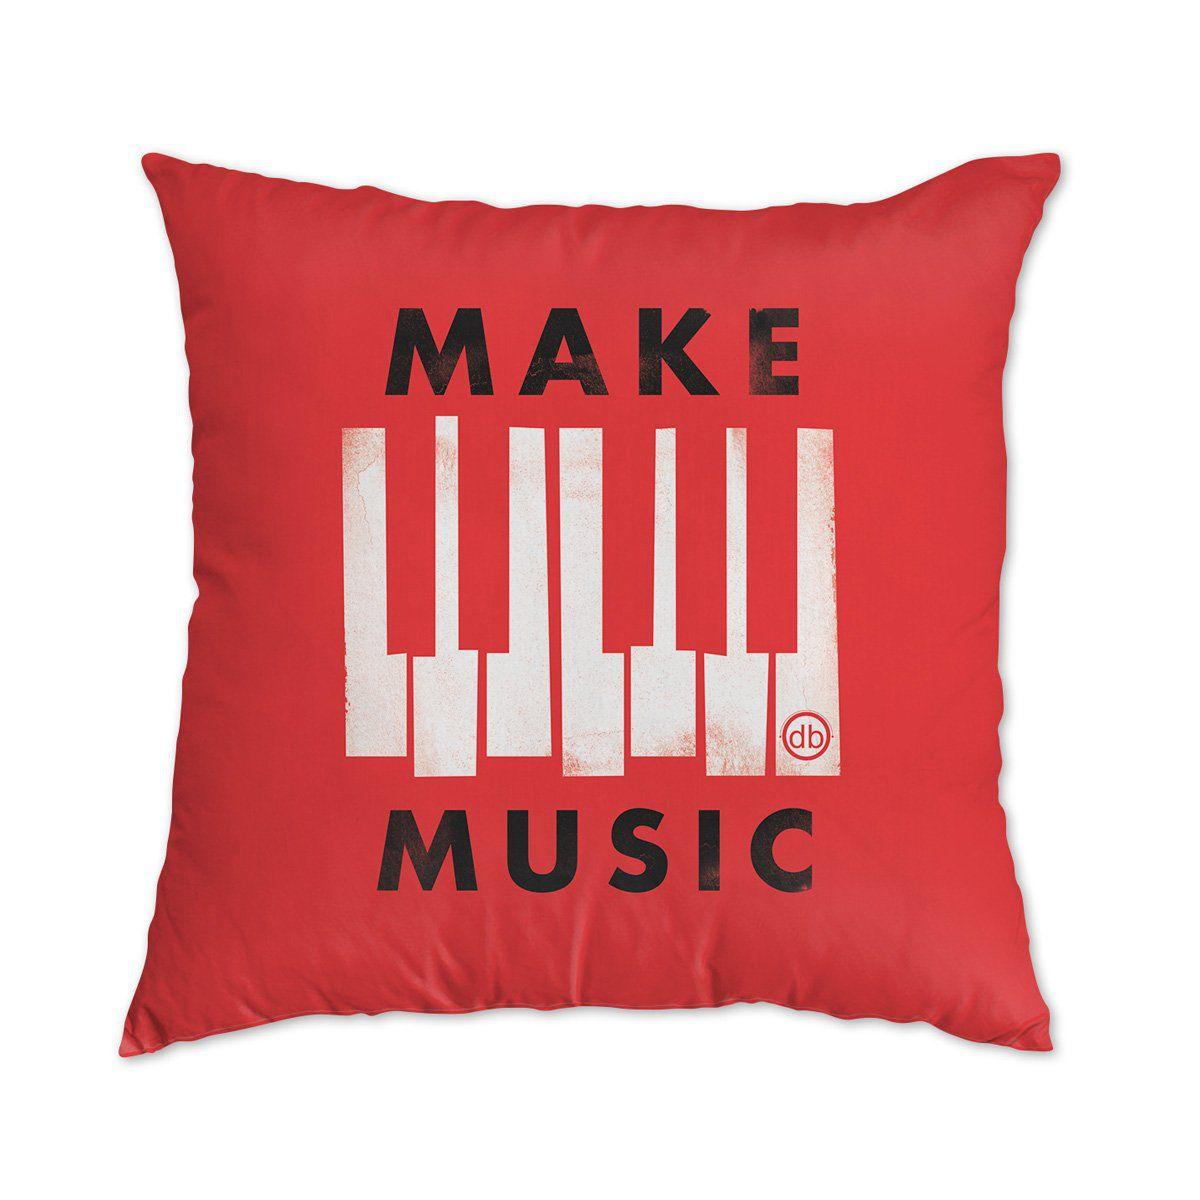 Almofada Dudu Borges Make Music  - bandUP Store Marketplace